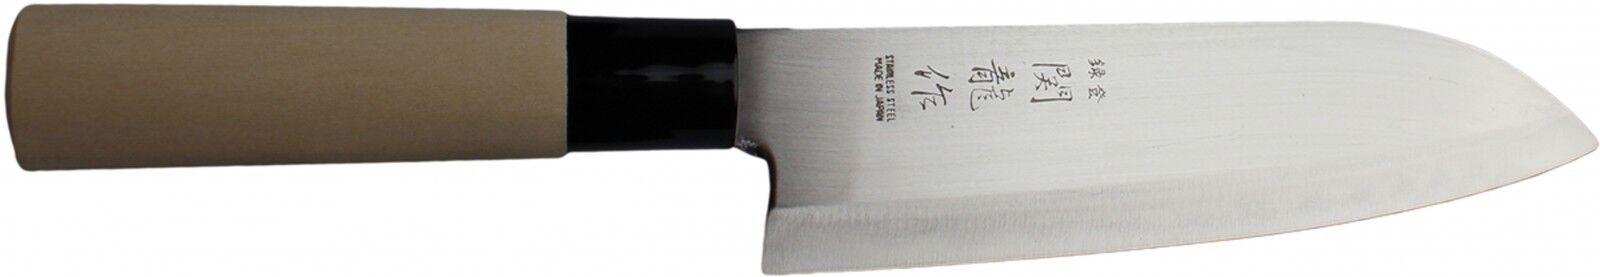 SEKIRYU [ Santoku ] japanisches Messer / Küchenmesser MADE IN JAPAN KV # SR100